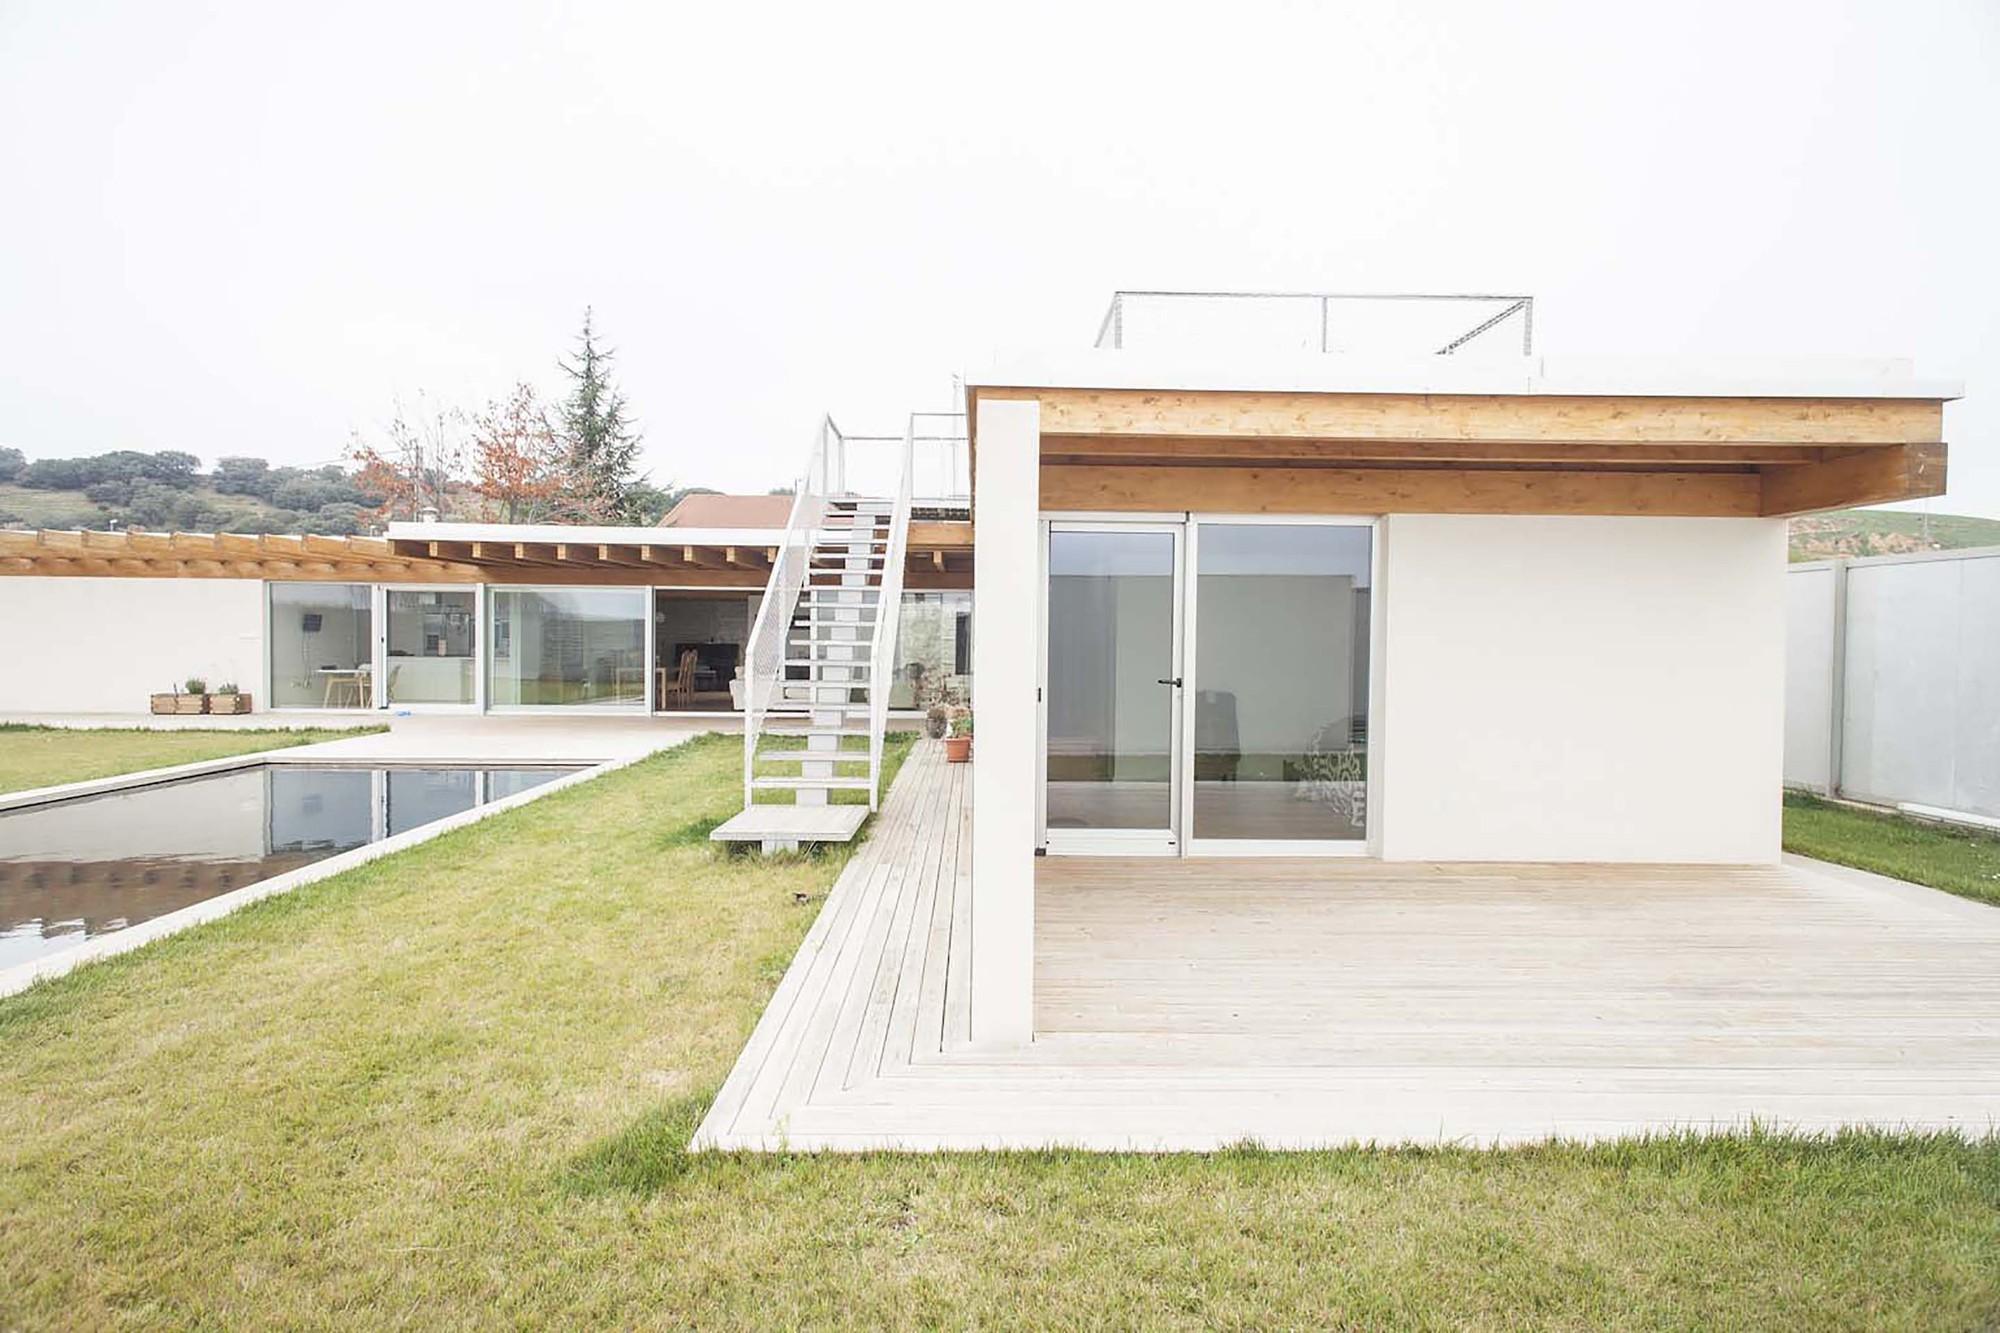 Galer a de vivienda fortaleza cso arquitectura 10 for Vivienda arquitectura